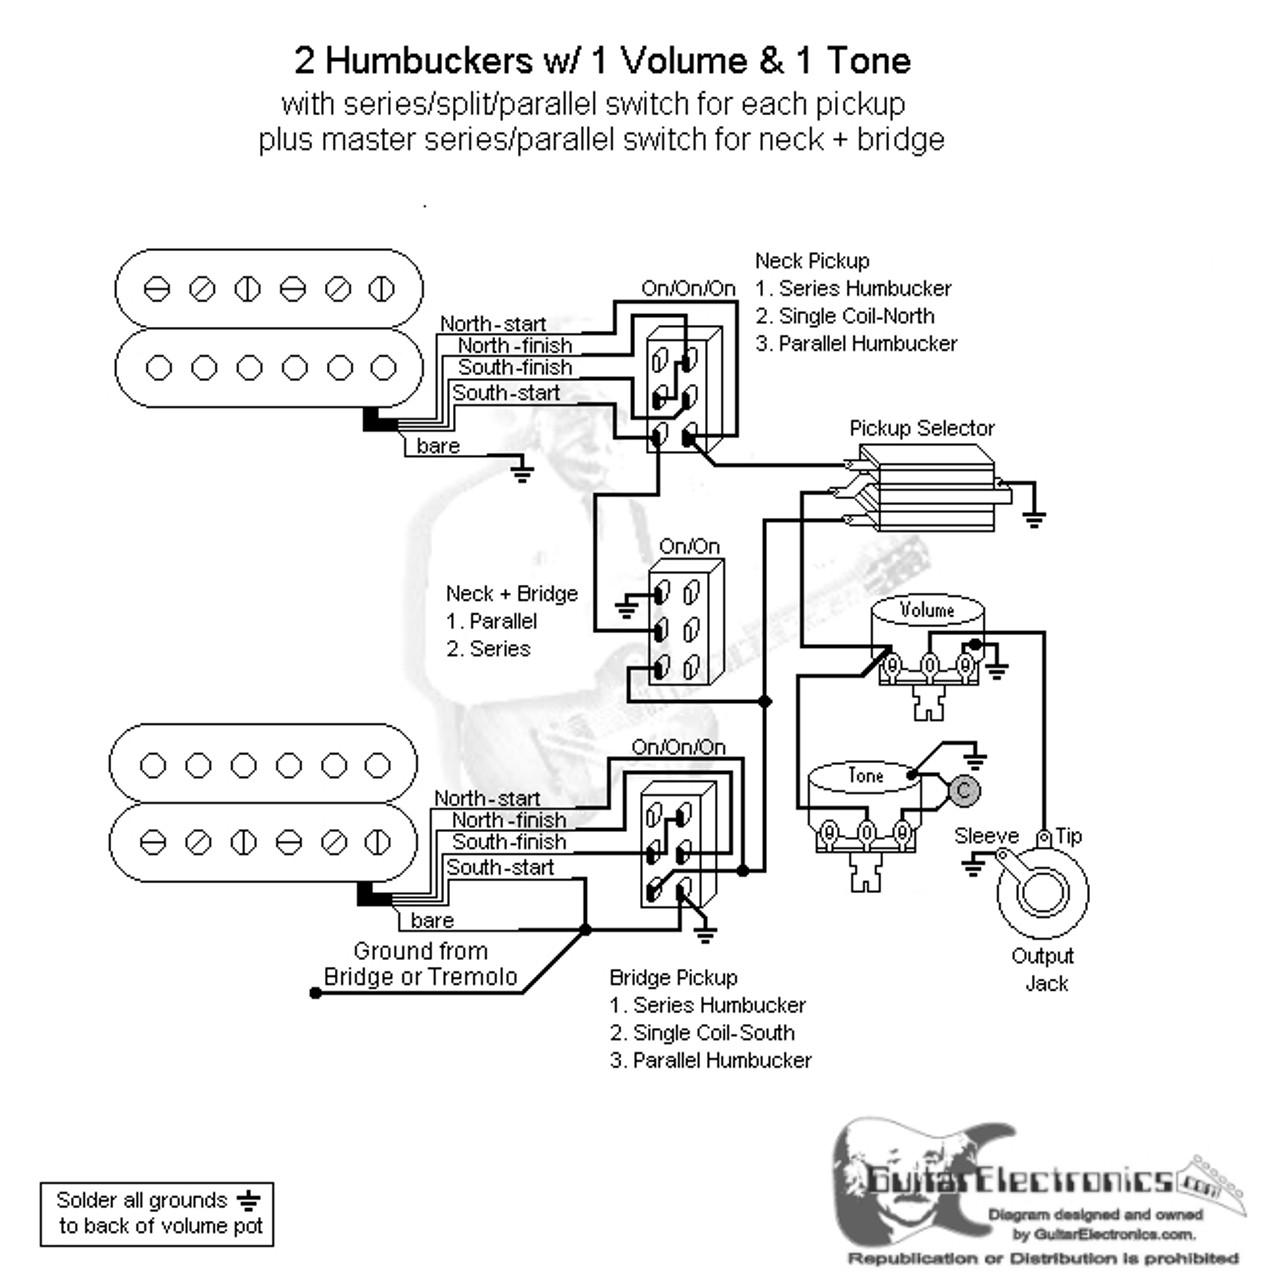 2 hbs 3 way toggle 1 vol 1 tone series split parallel u0026 master ethernet switch wiring diagram 2 hbs 3 way toggle 1 vol 1 tone series split parallel  [ 1280 x 1280 Pixel ]